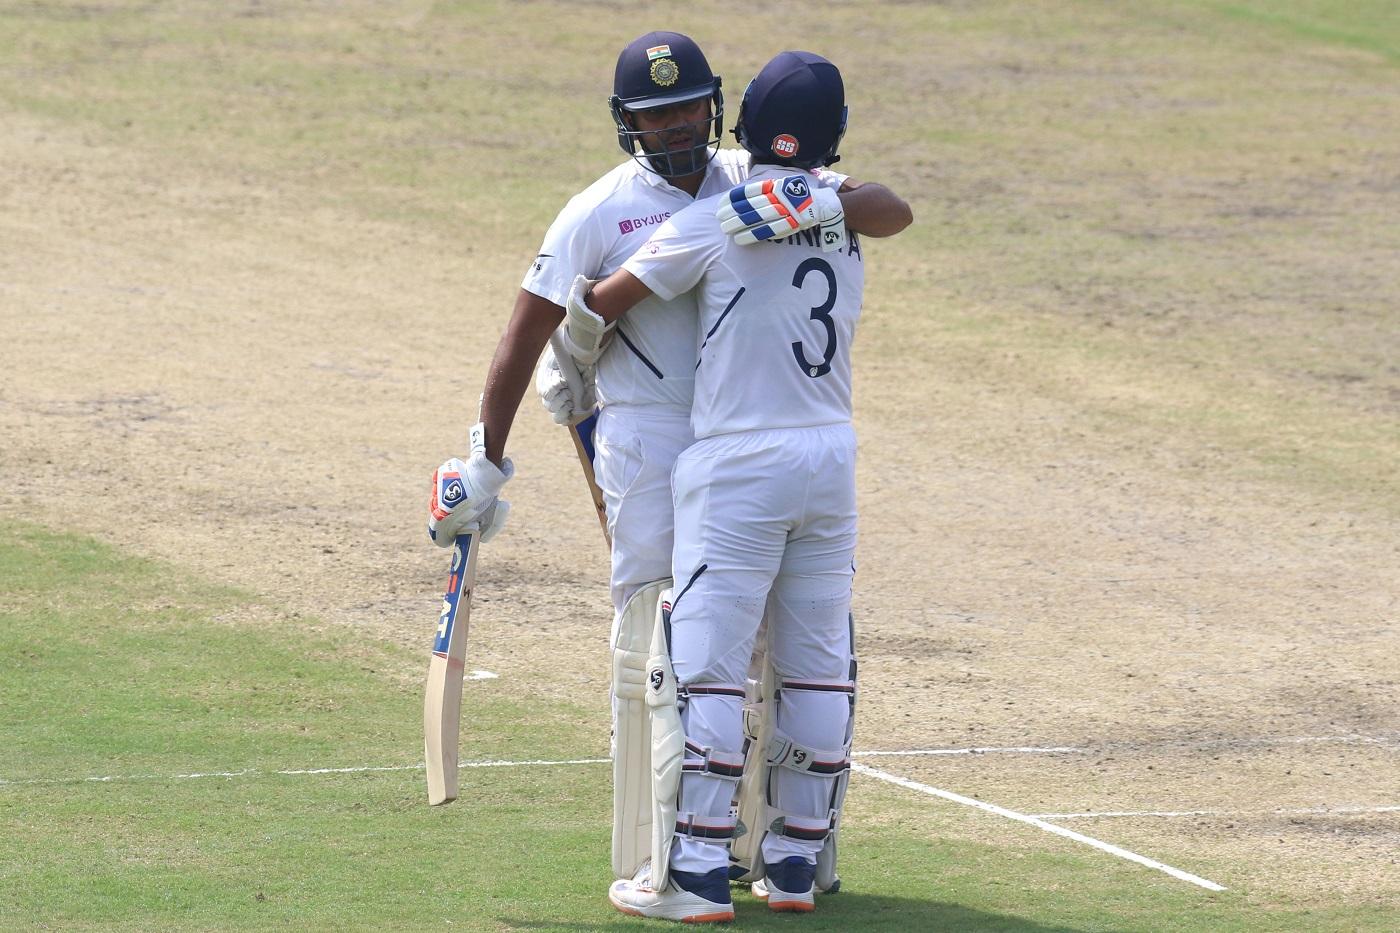 South Africa rocked after Rohit Sharma 212, Ajinkya Rahane 115